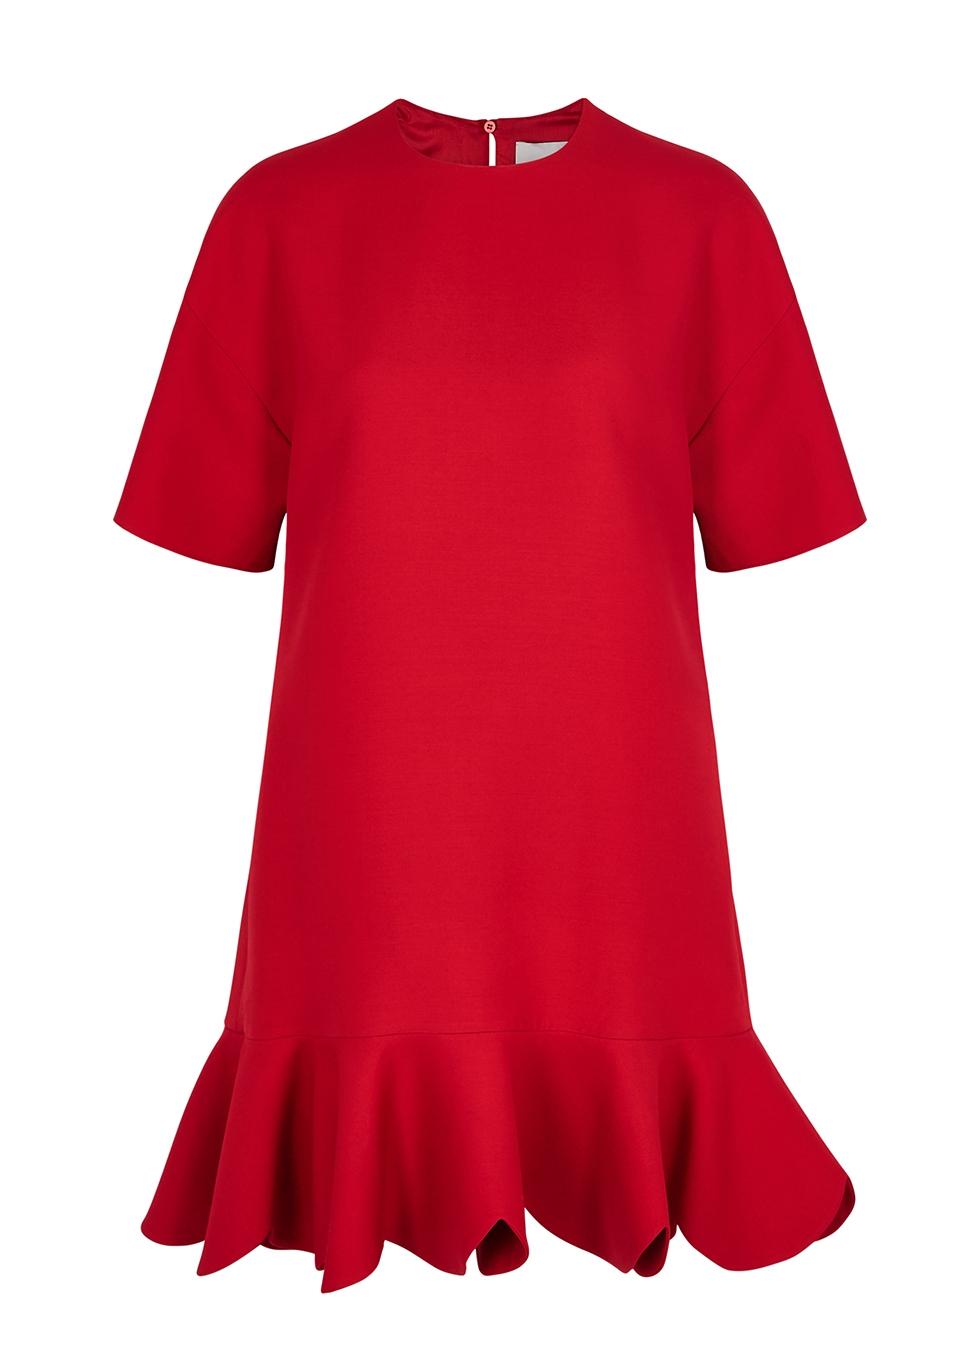 VALENTINO   Valentino Red Scalloped Wool-Blend Dress   Goxip